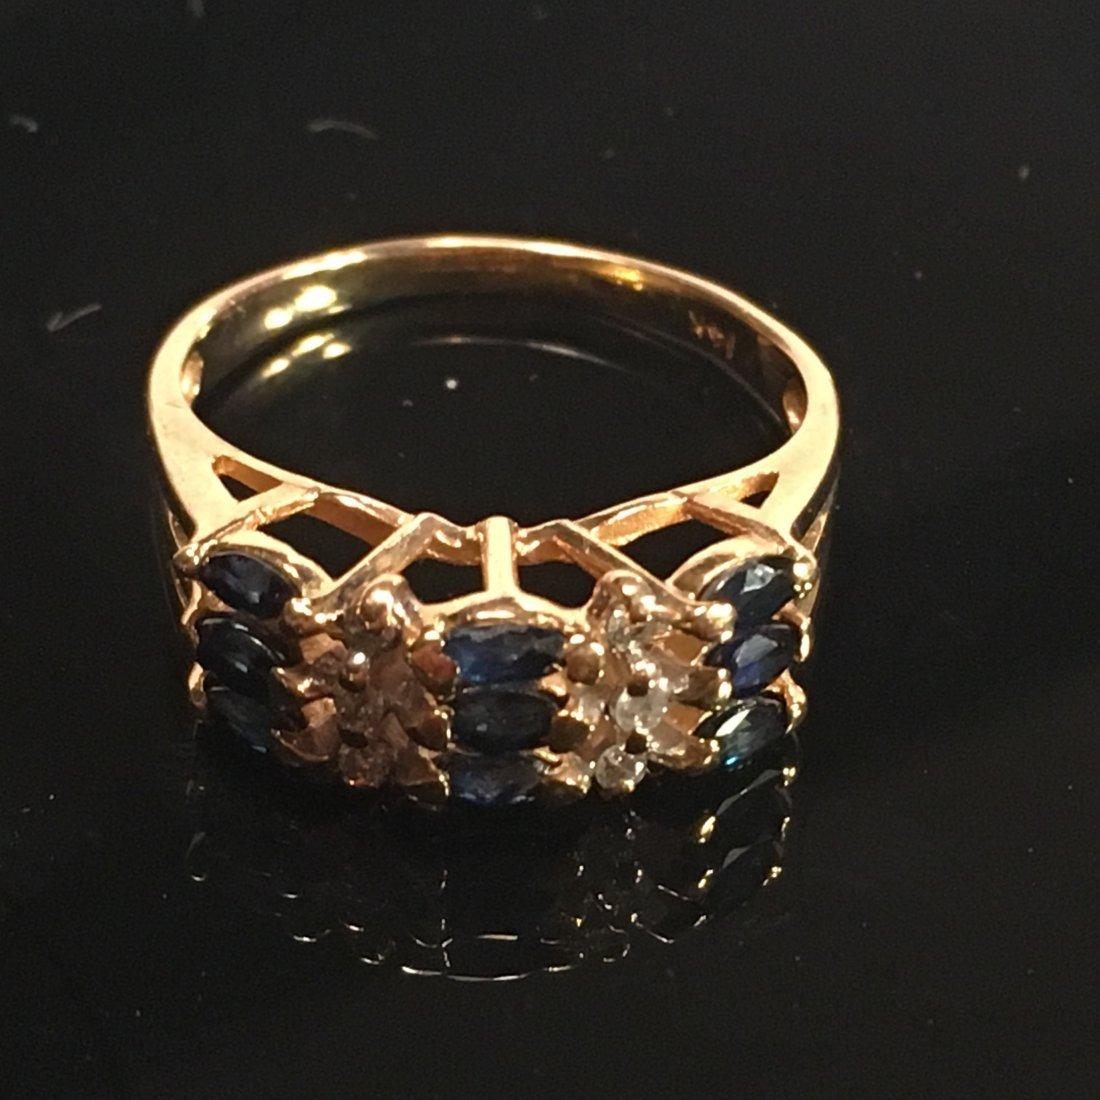 Feminine Ladies Sapphire & Diamond Ring Gold Setting